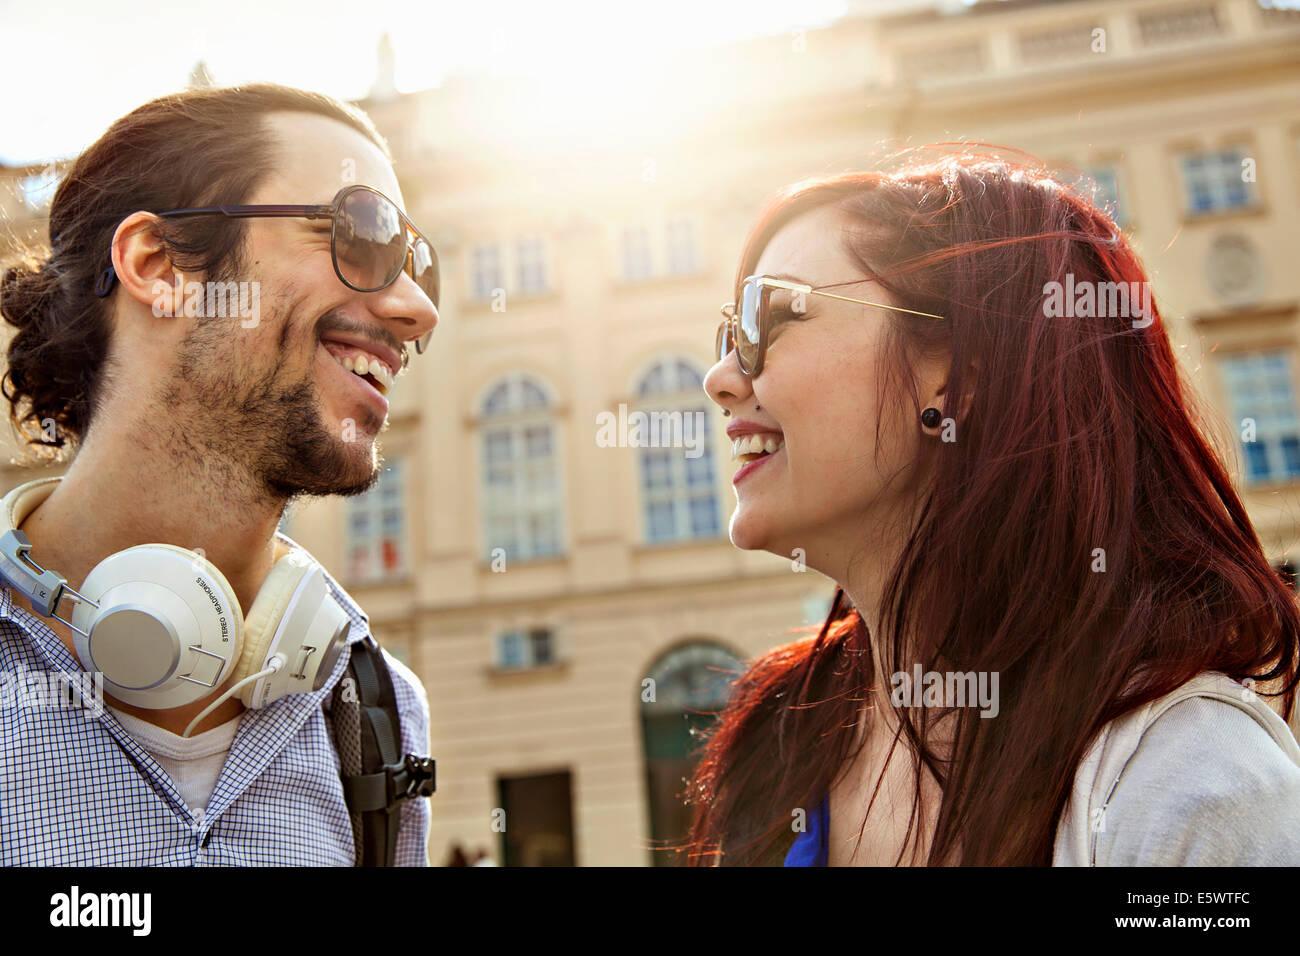 Adulto joven pareja, cara a cara. Imagen De Stock